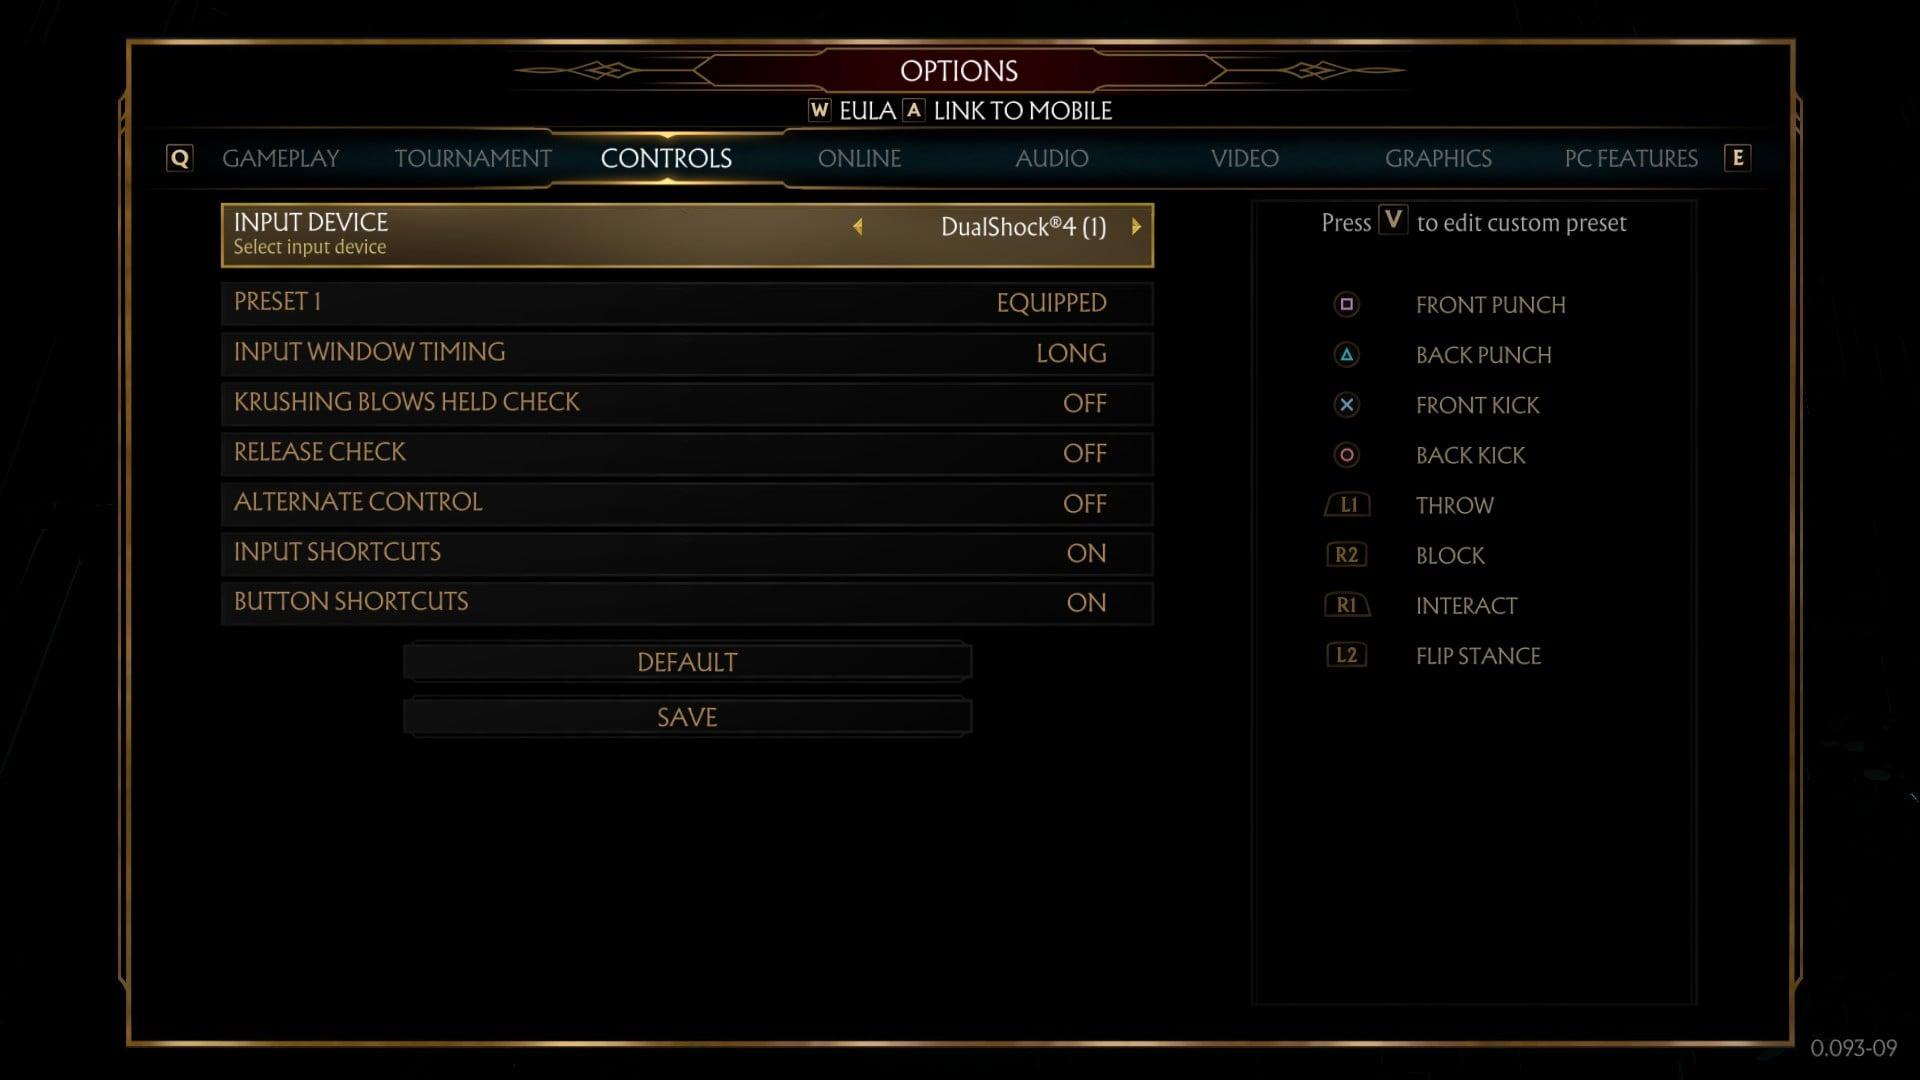 Mortal Kombat 11 - PS4 Controller Button Layout - Naguide